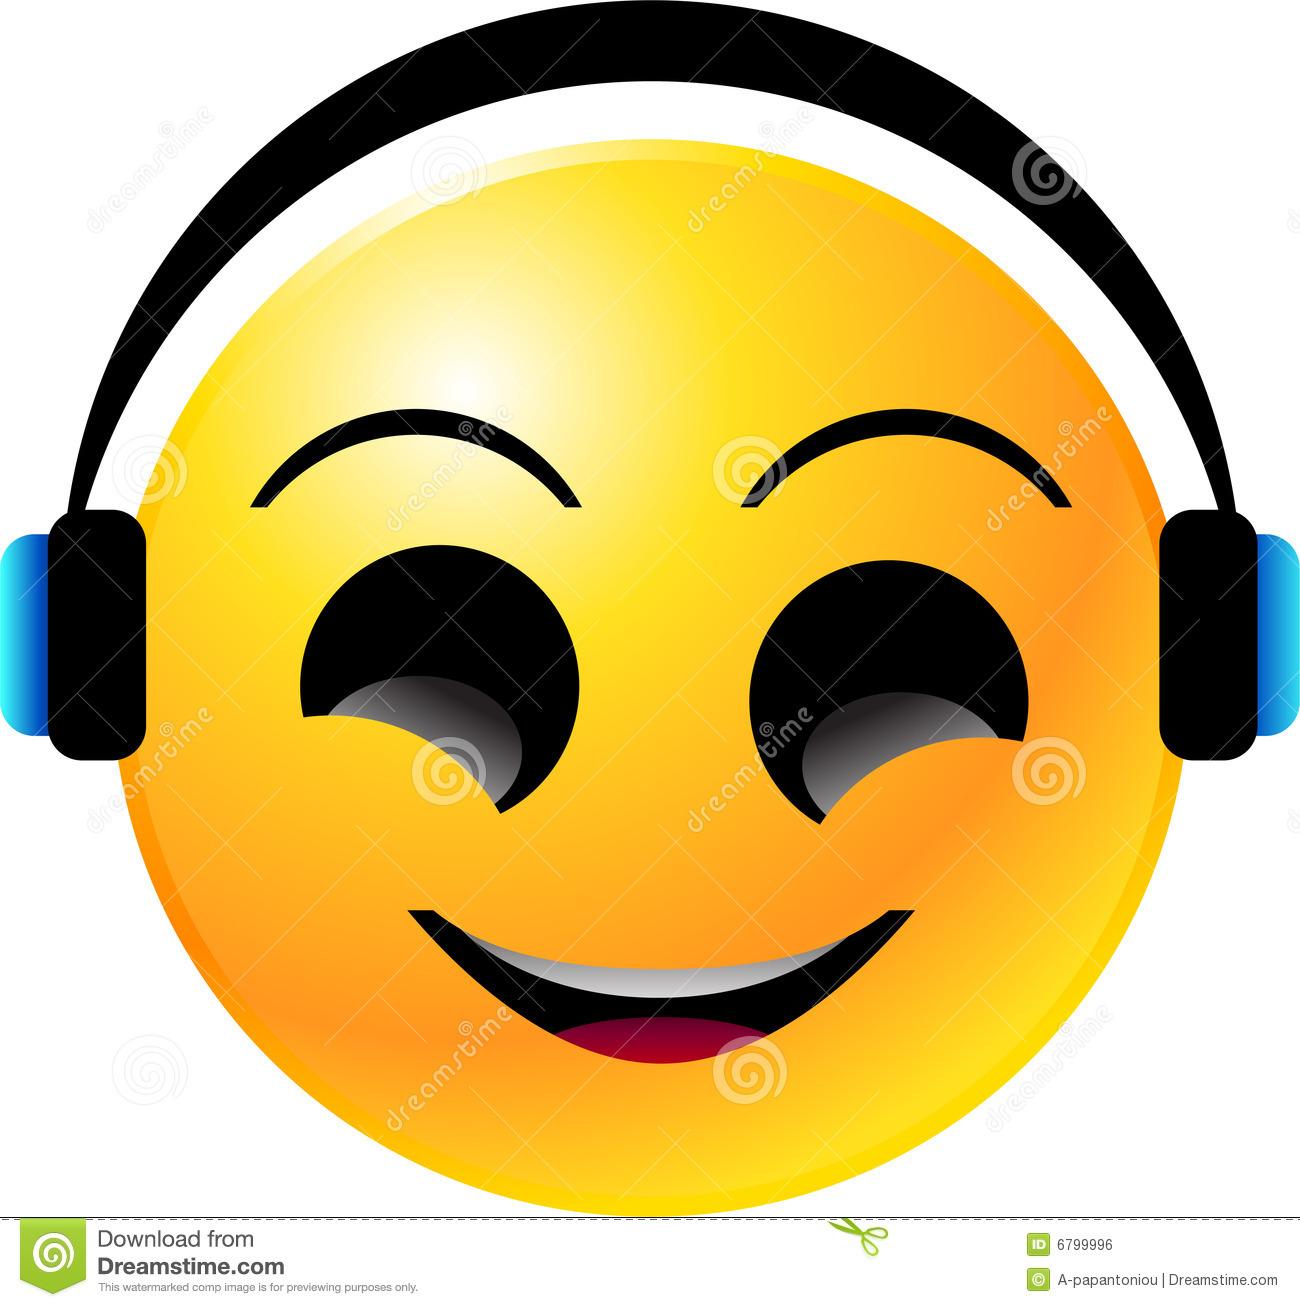 ... clip-art-emotions-clipart-panda-free-clipart-images-Ym1ZBP-clipart.jpg